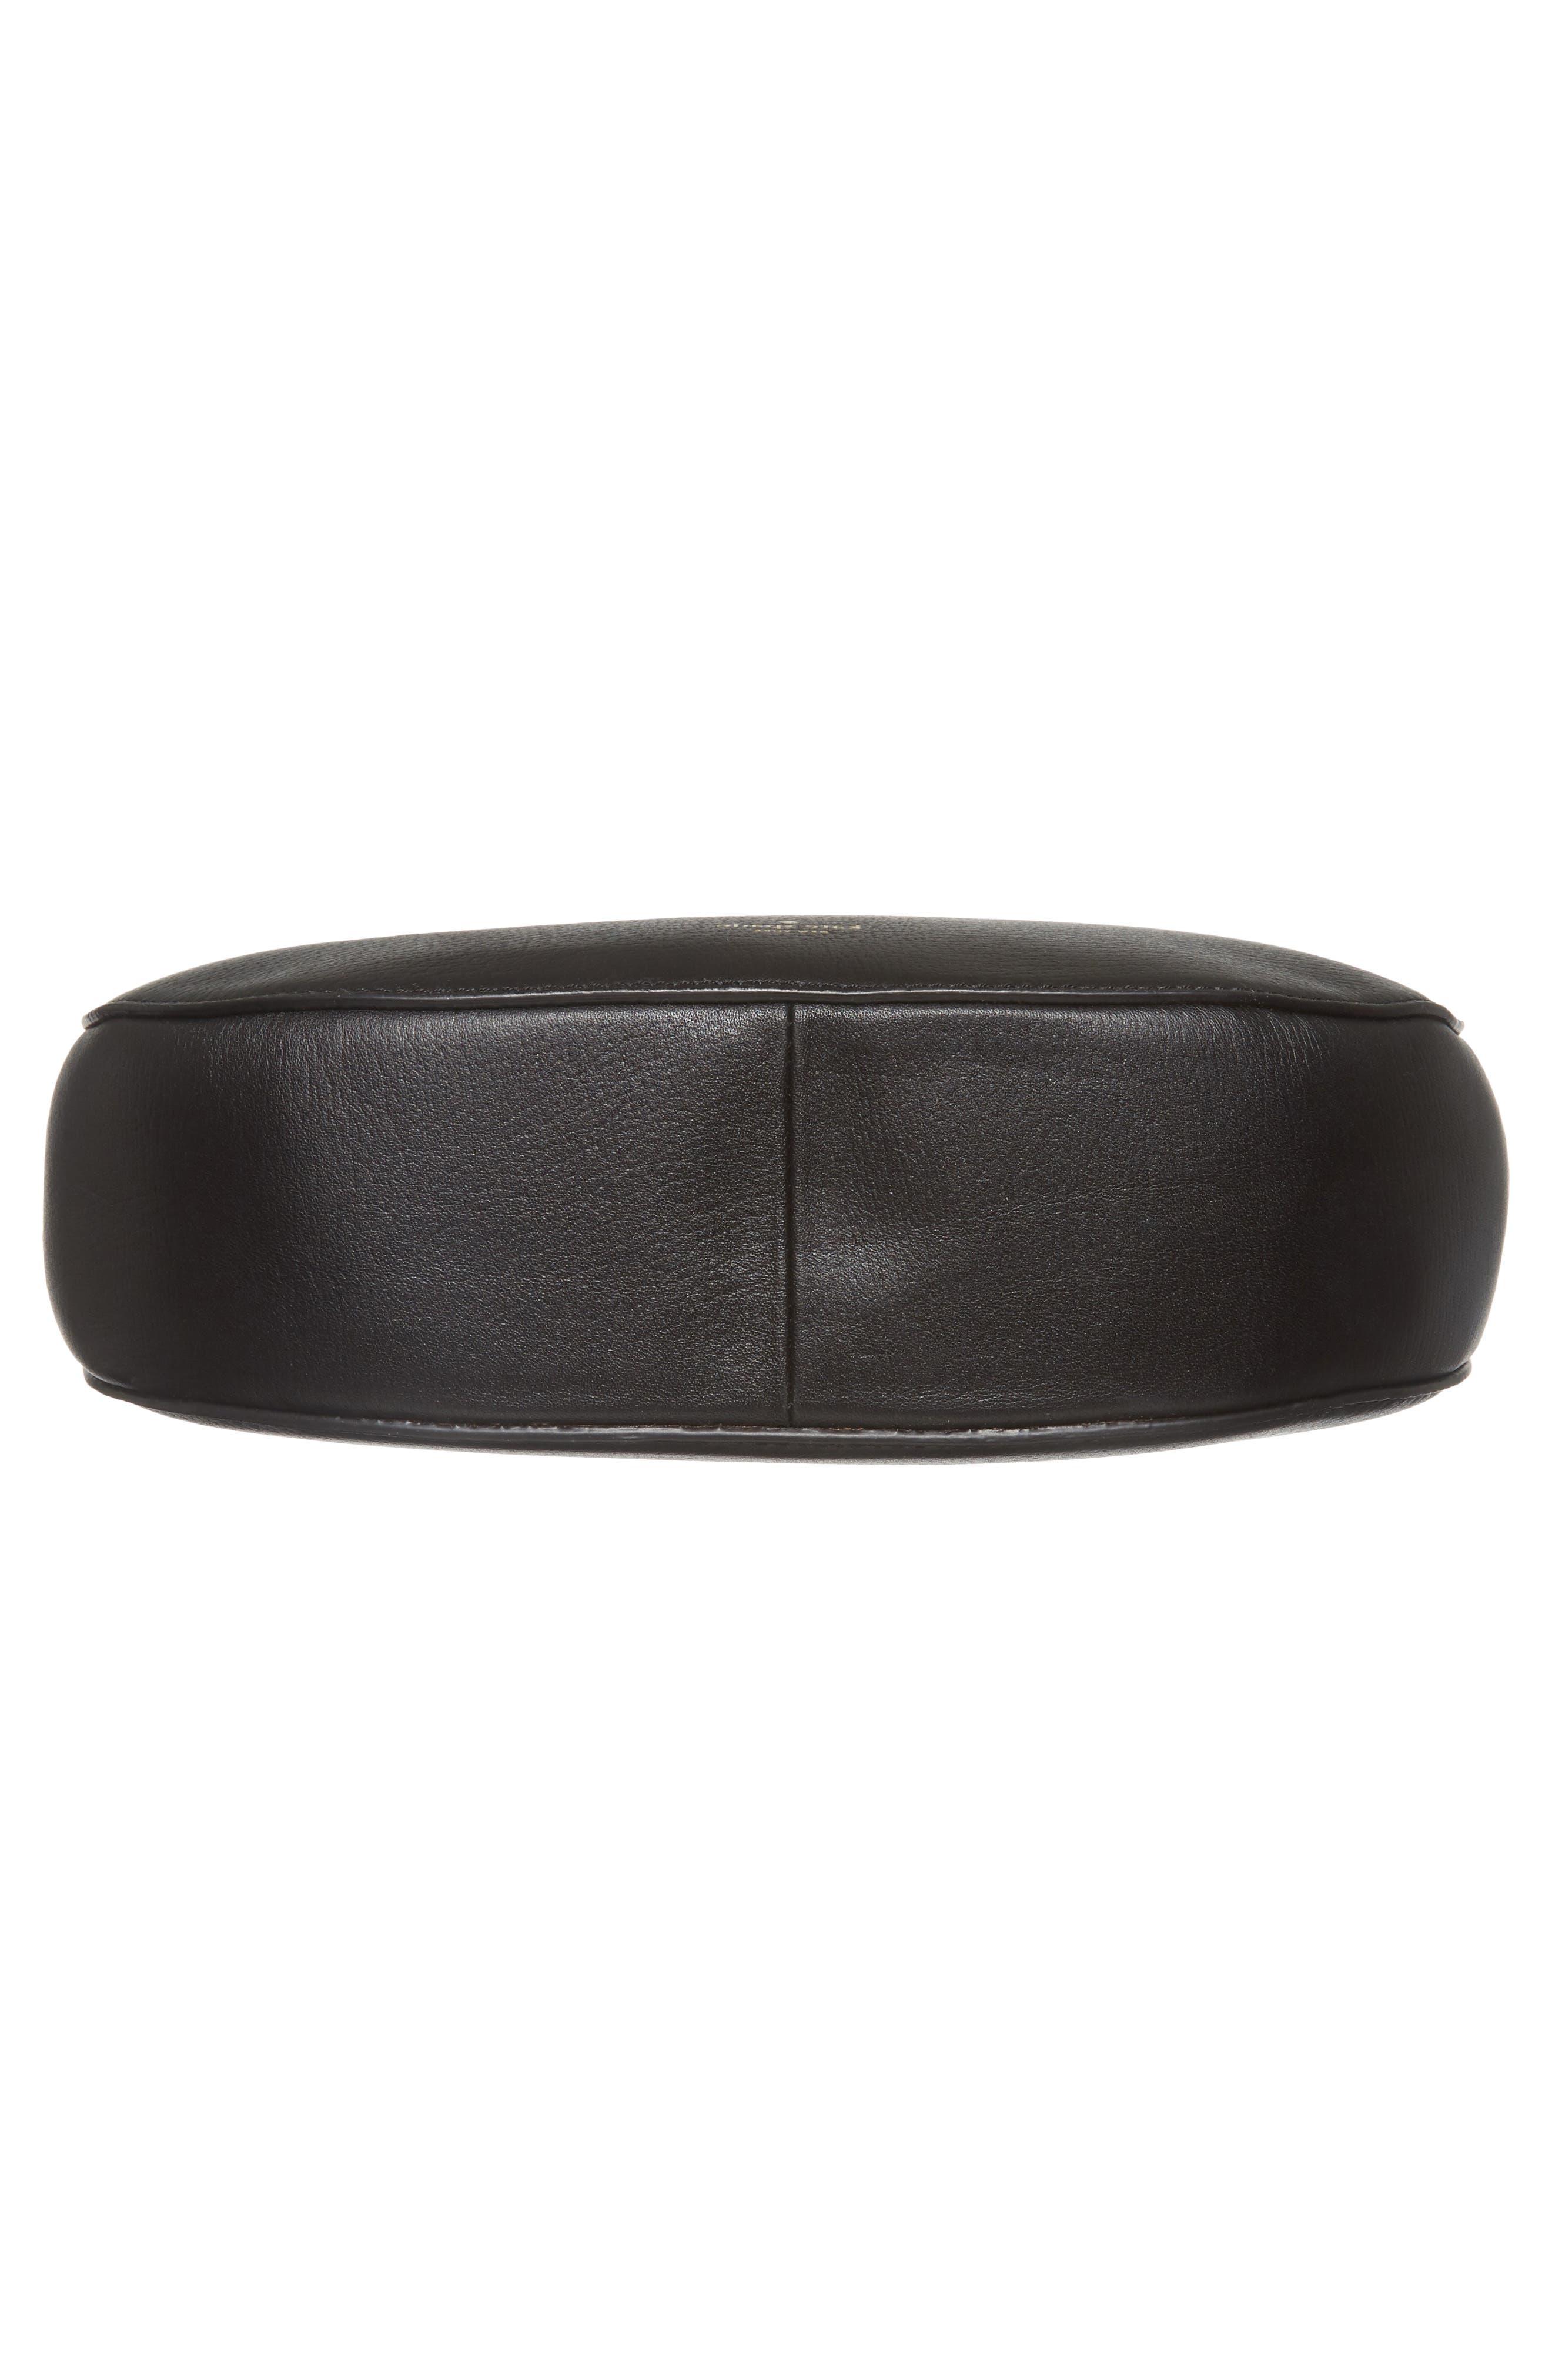 olive drive - robin leather crossbody bag,                             Alternate thumbnail 11, color,